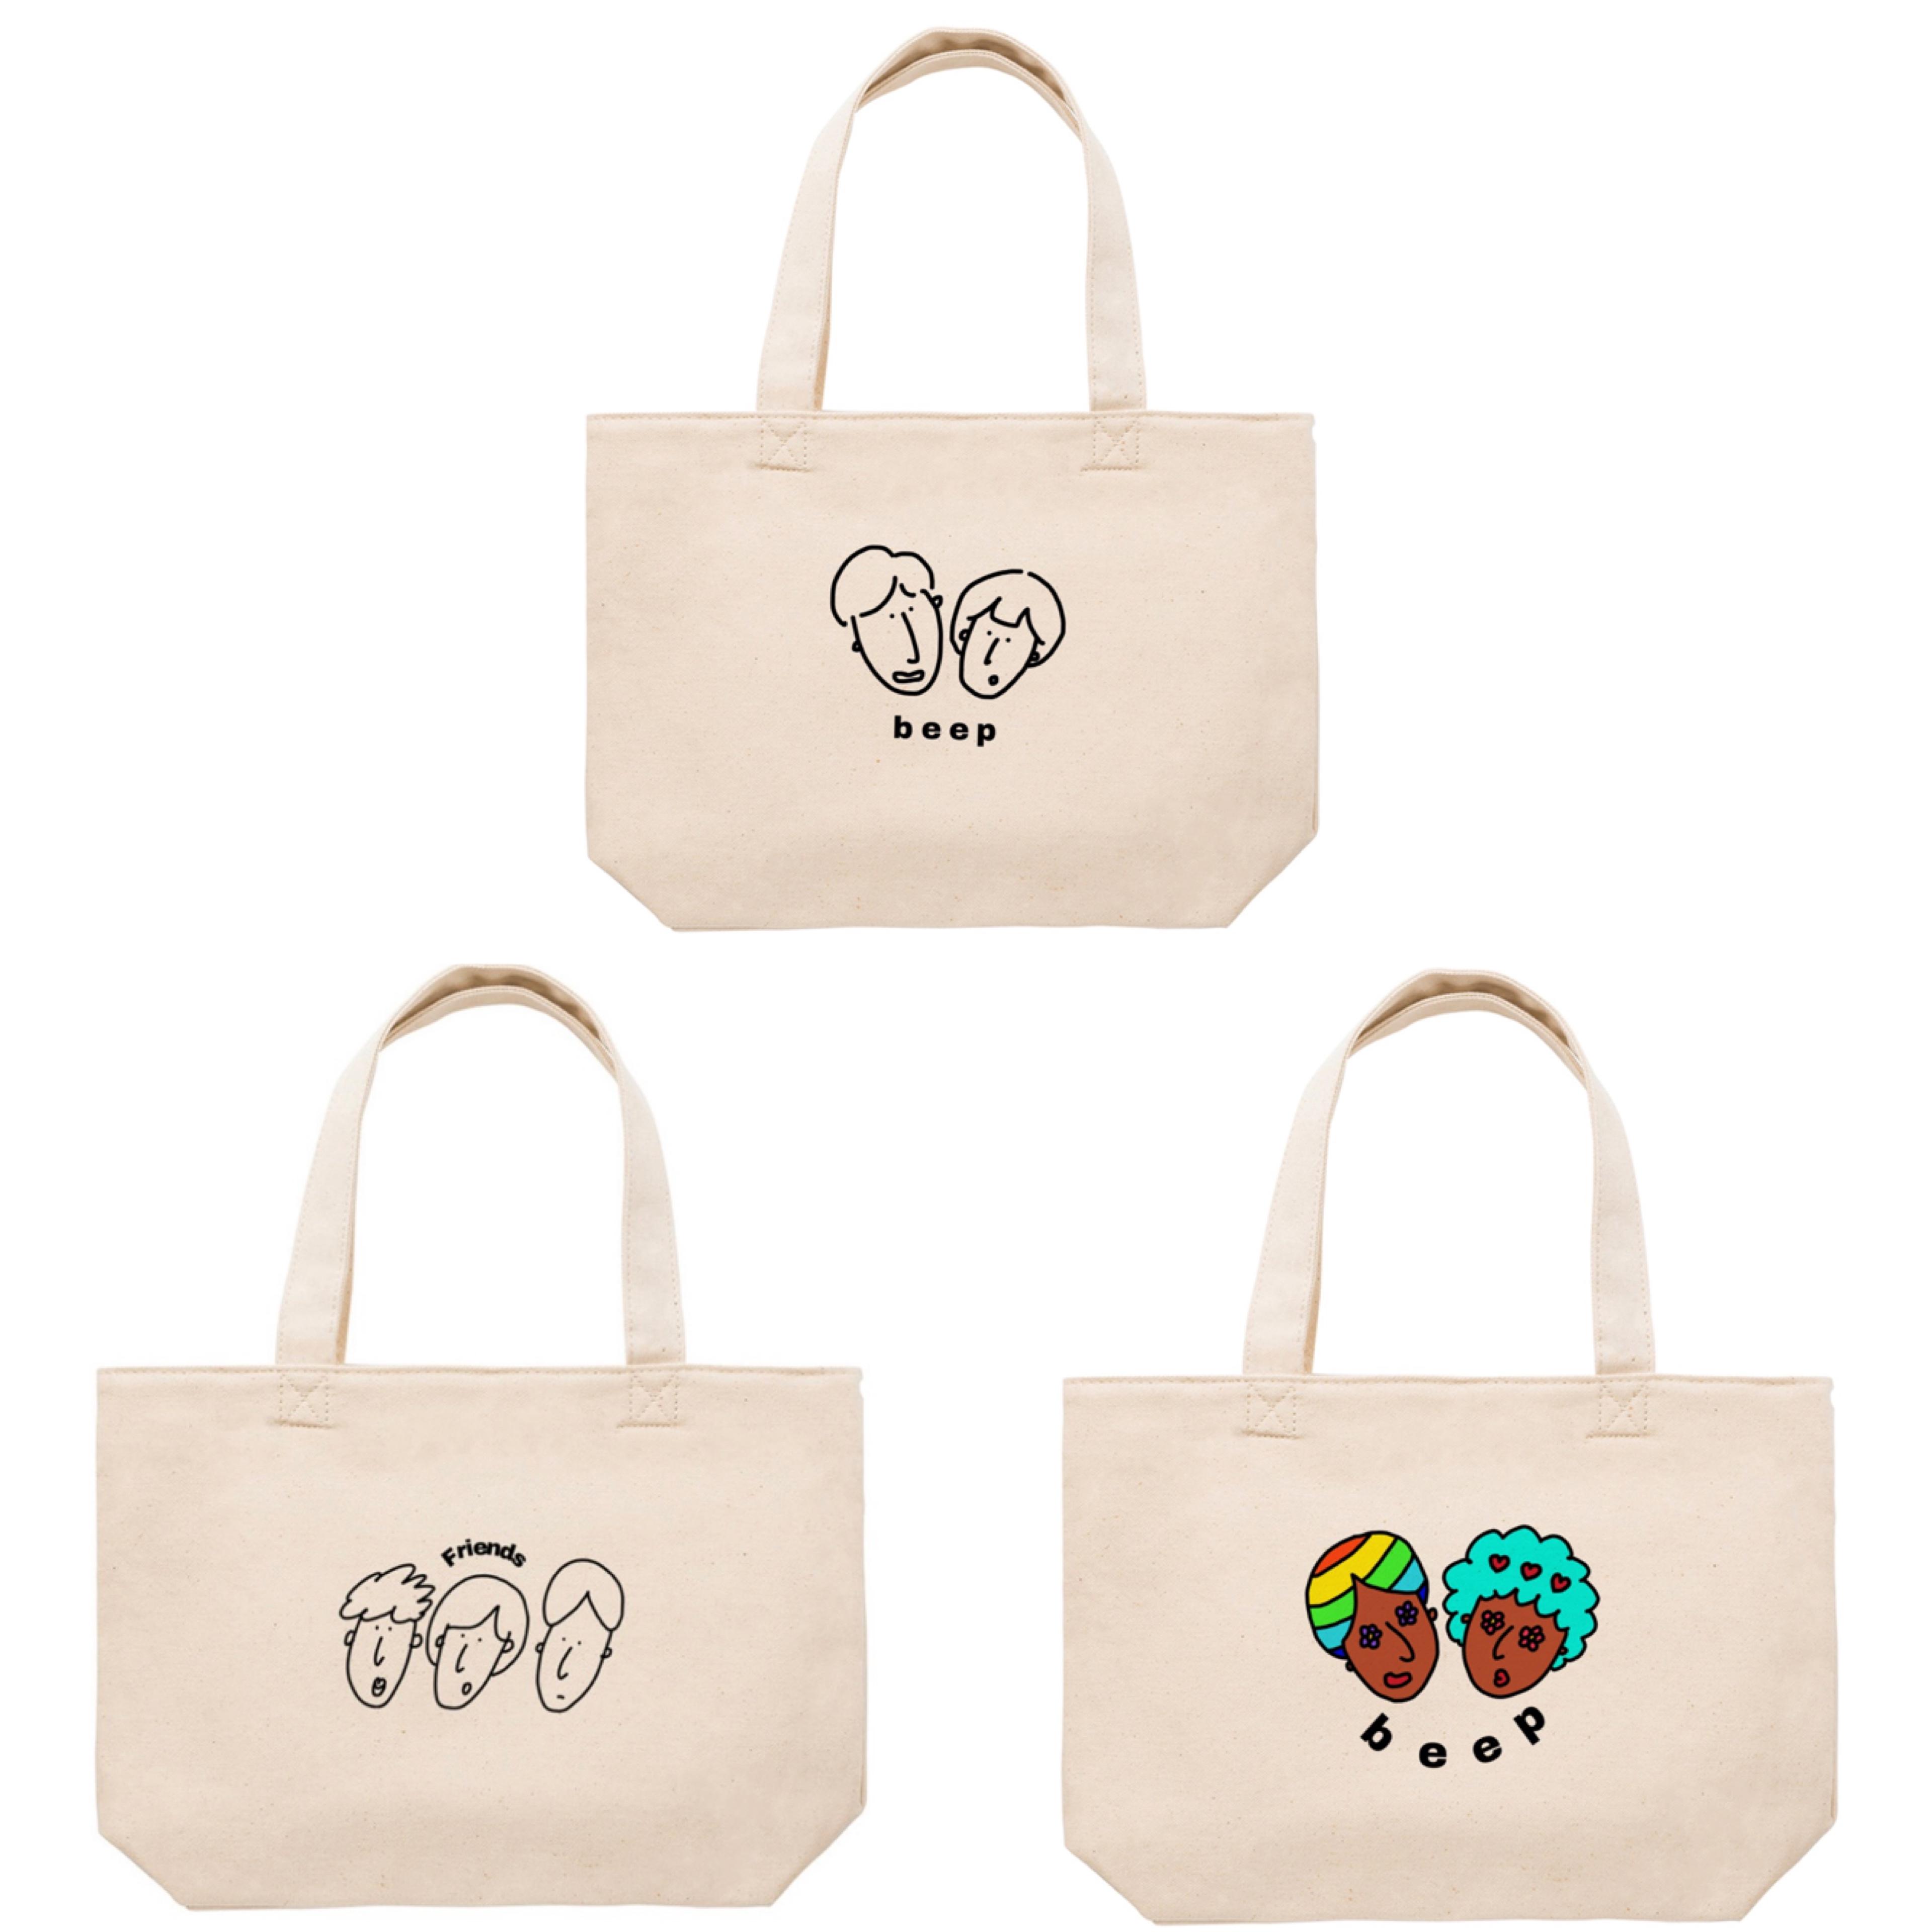 beep × PONA  ワンポイントが可愛い♡どんな場面でも使いやすいミニトートバッグ